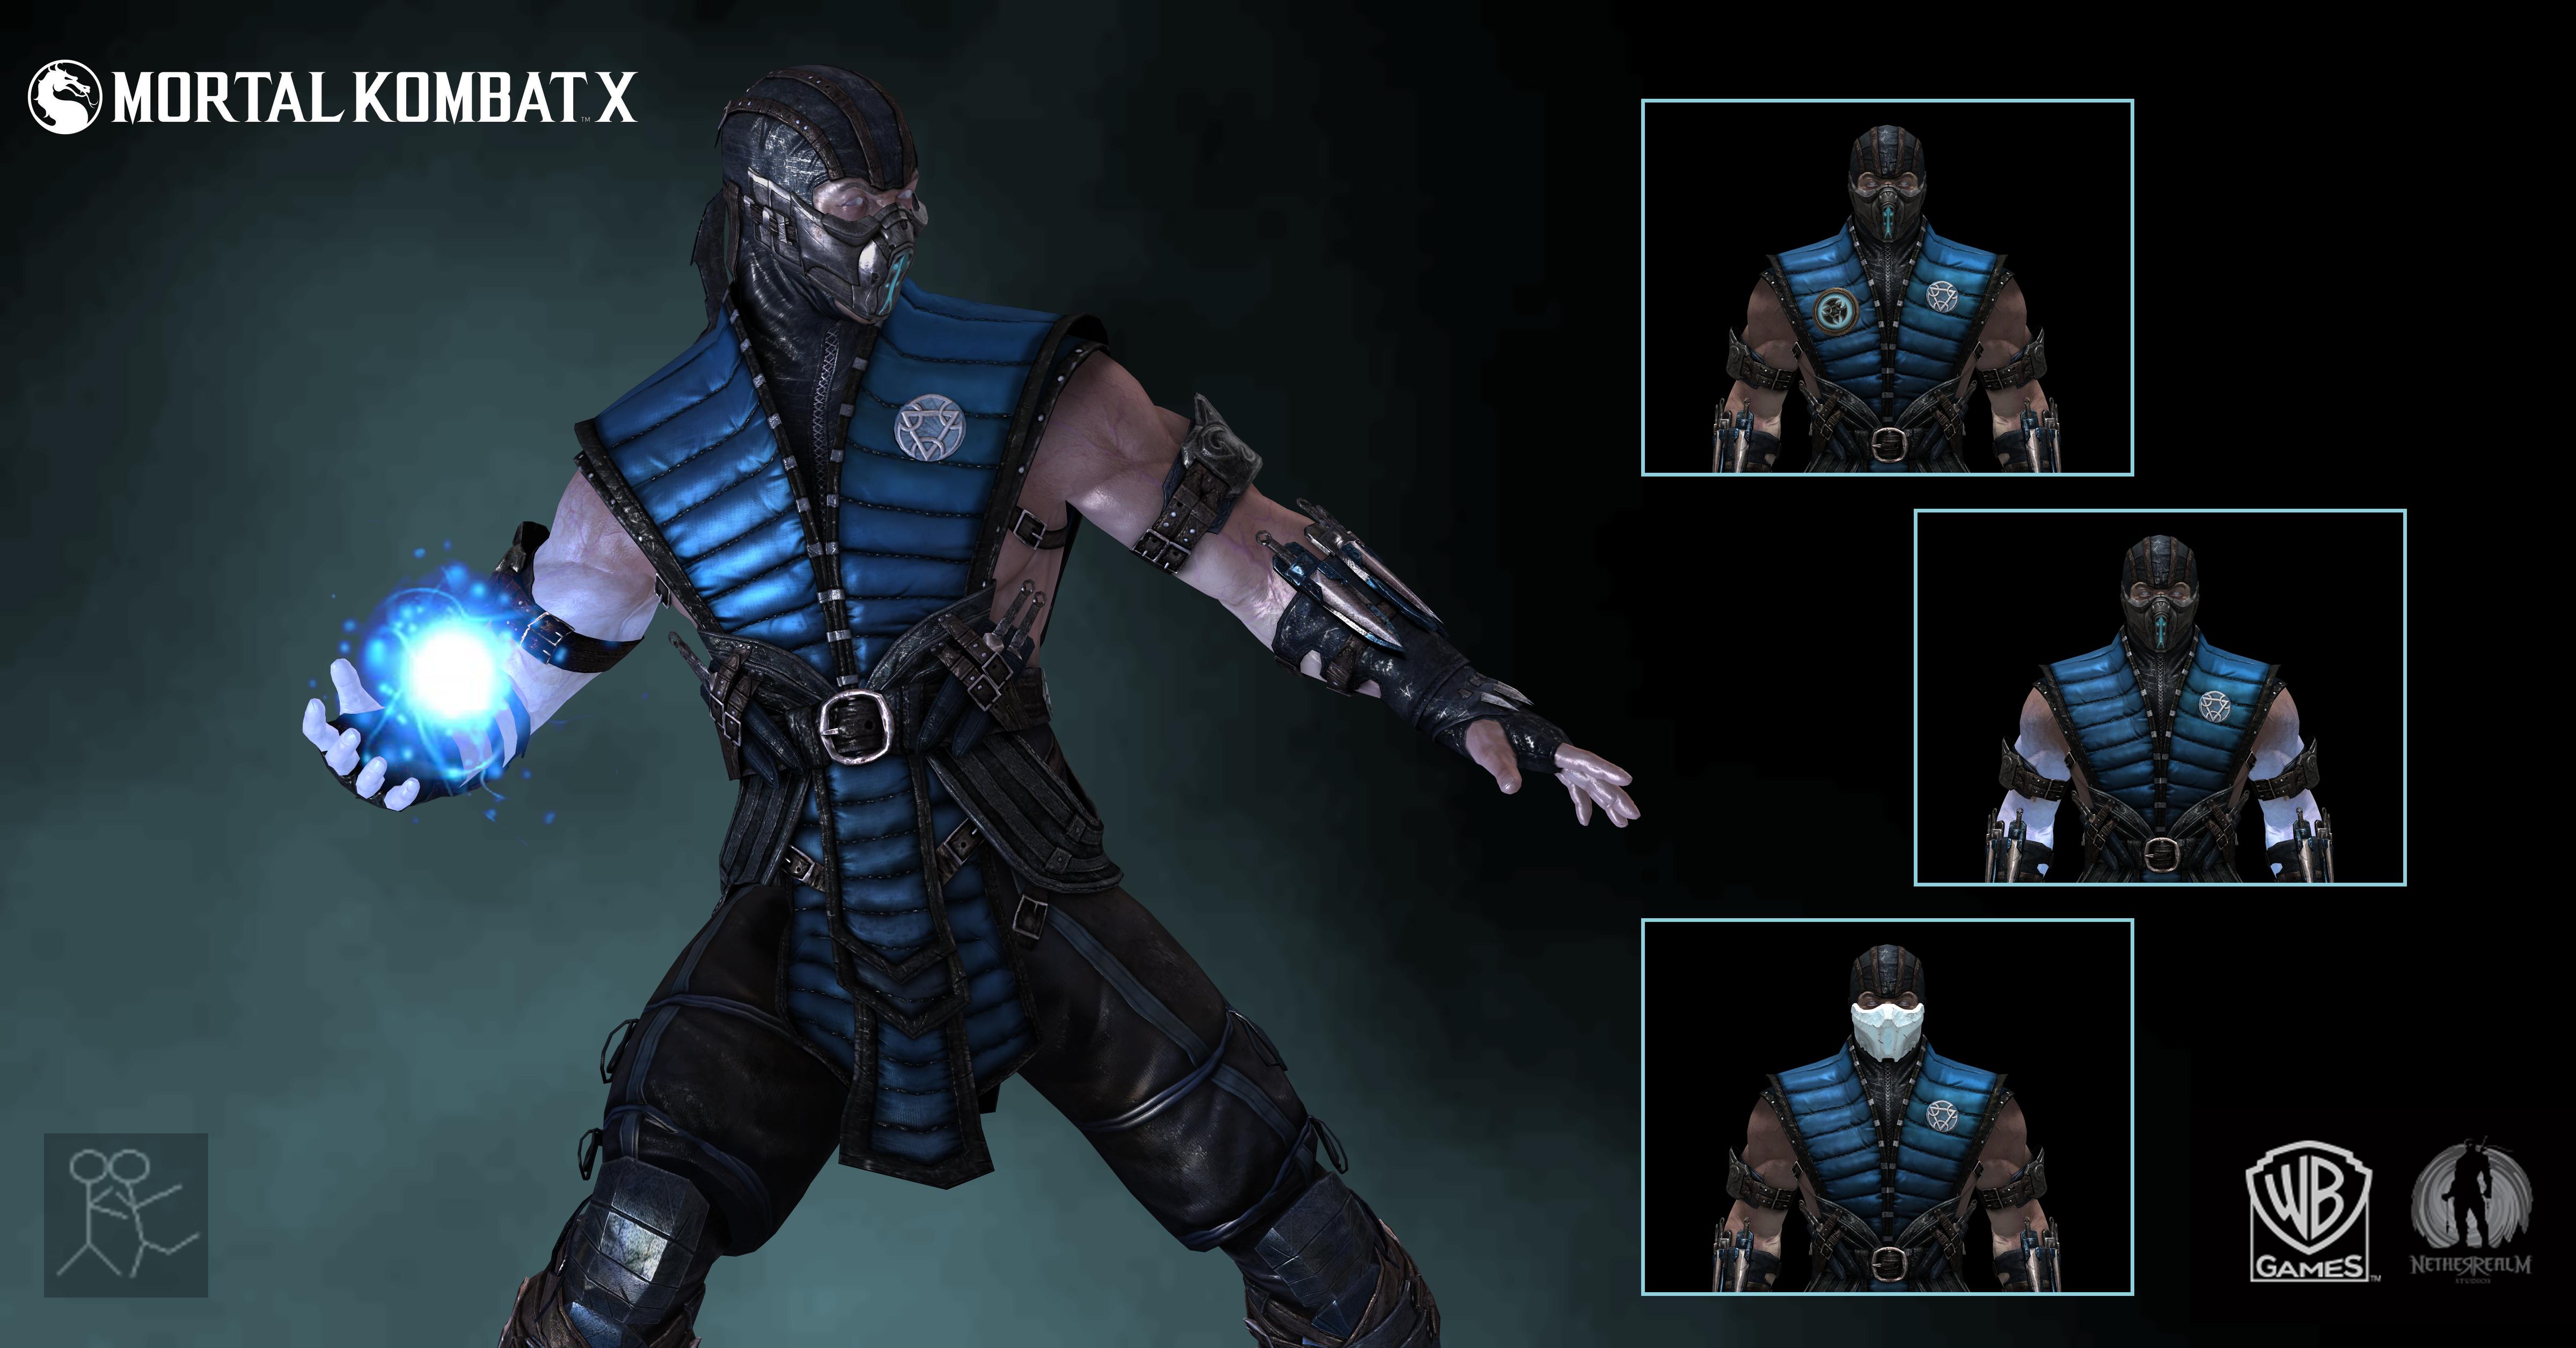 Free Adult Pics Of Mortal Kombat 51